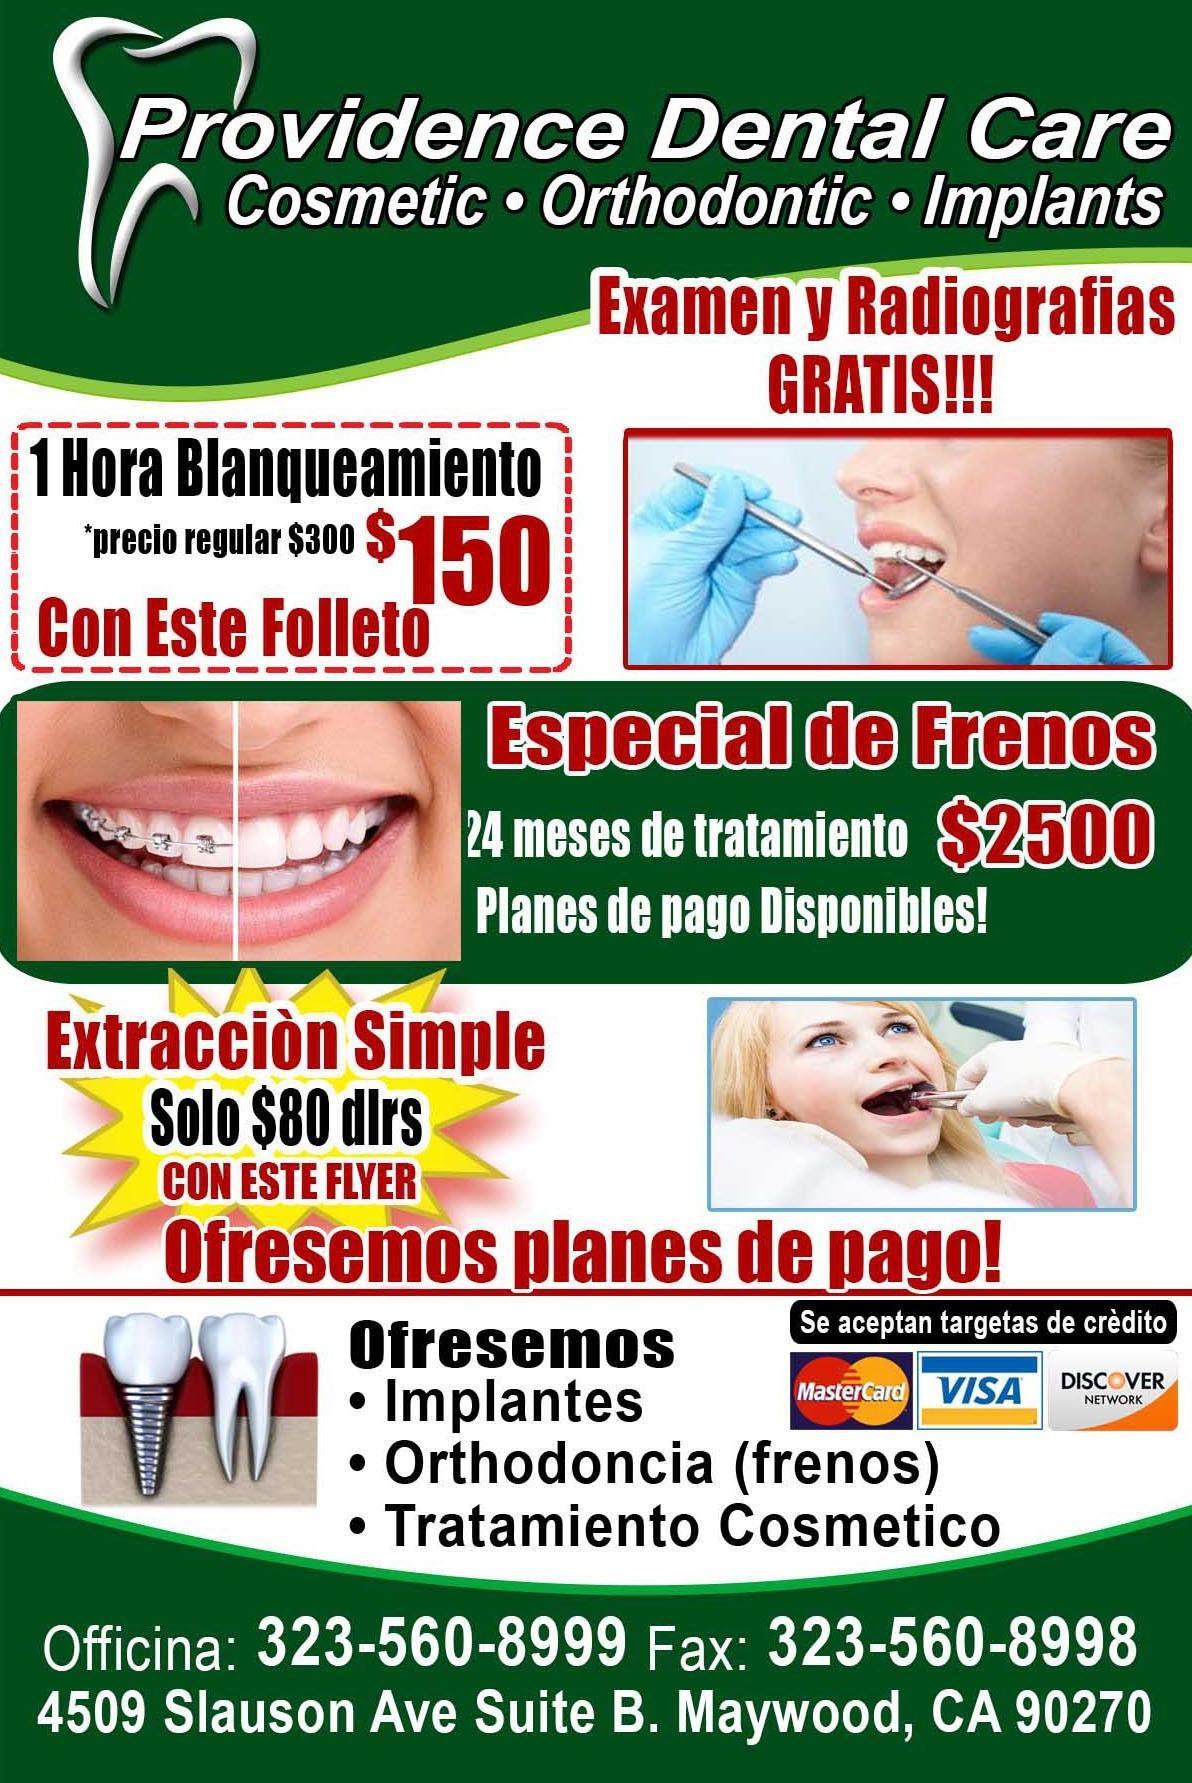 Providence Dental Care image 1